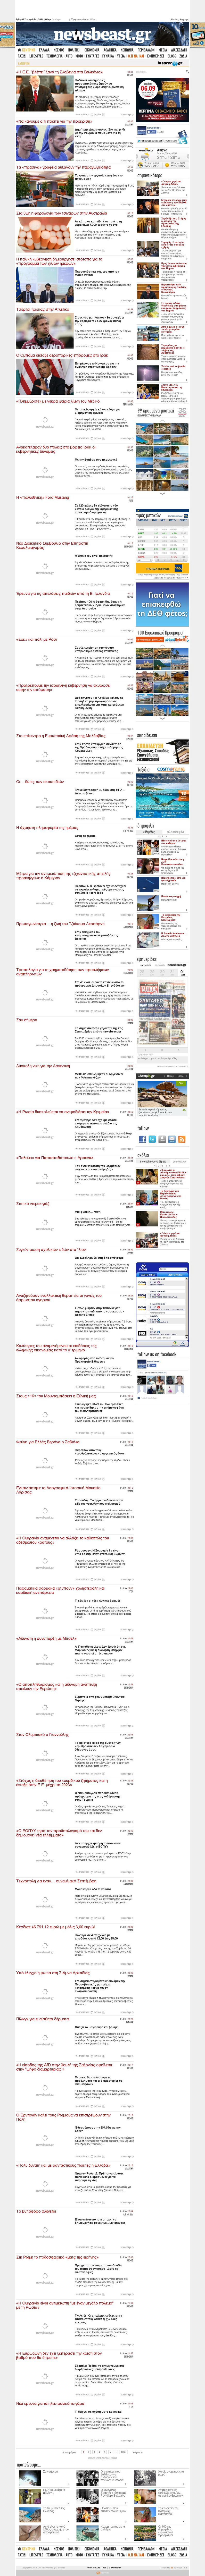 News Beast at Tuesday Sept. 2, 2014, 12:14 a.m. UTC